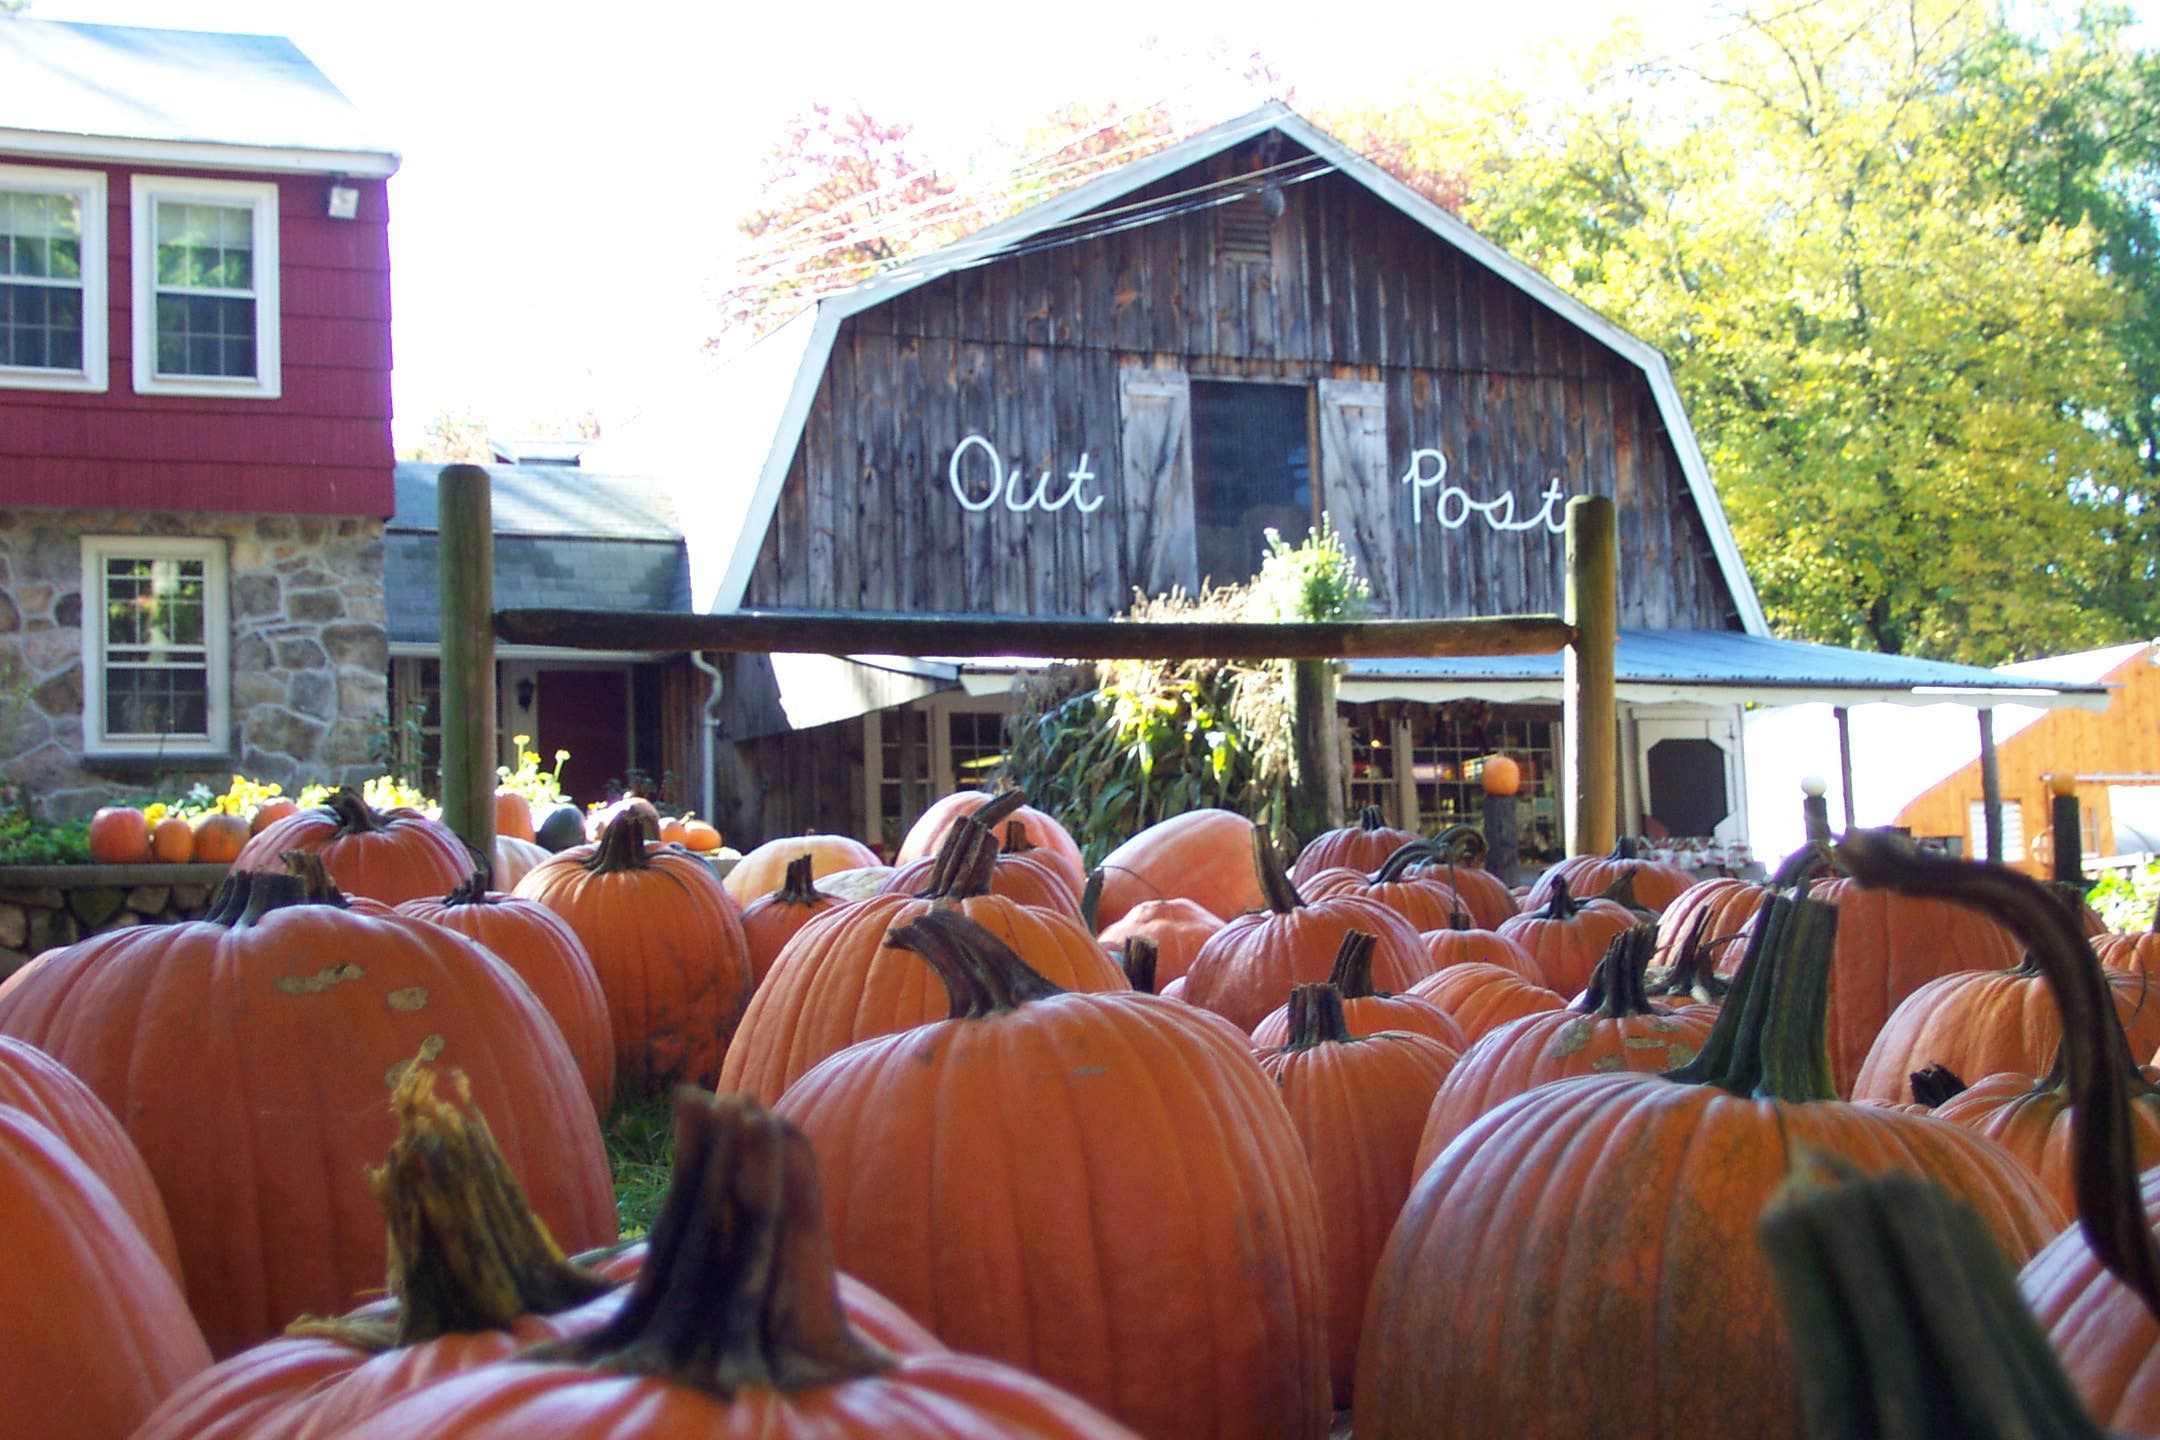 Love Their Turkey Sandwiches Outpost Farm Holliston Massachusetts In The Fall With Pumpkins Holliston Massachusetts Middlesex County Farm Massachusetts